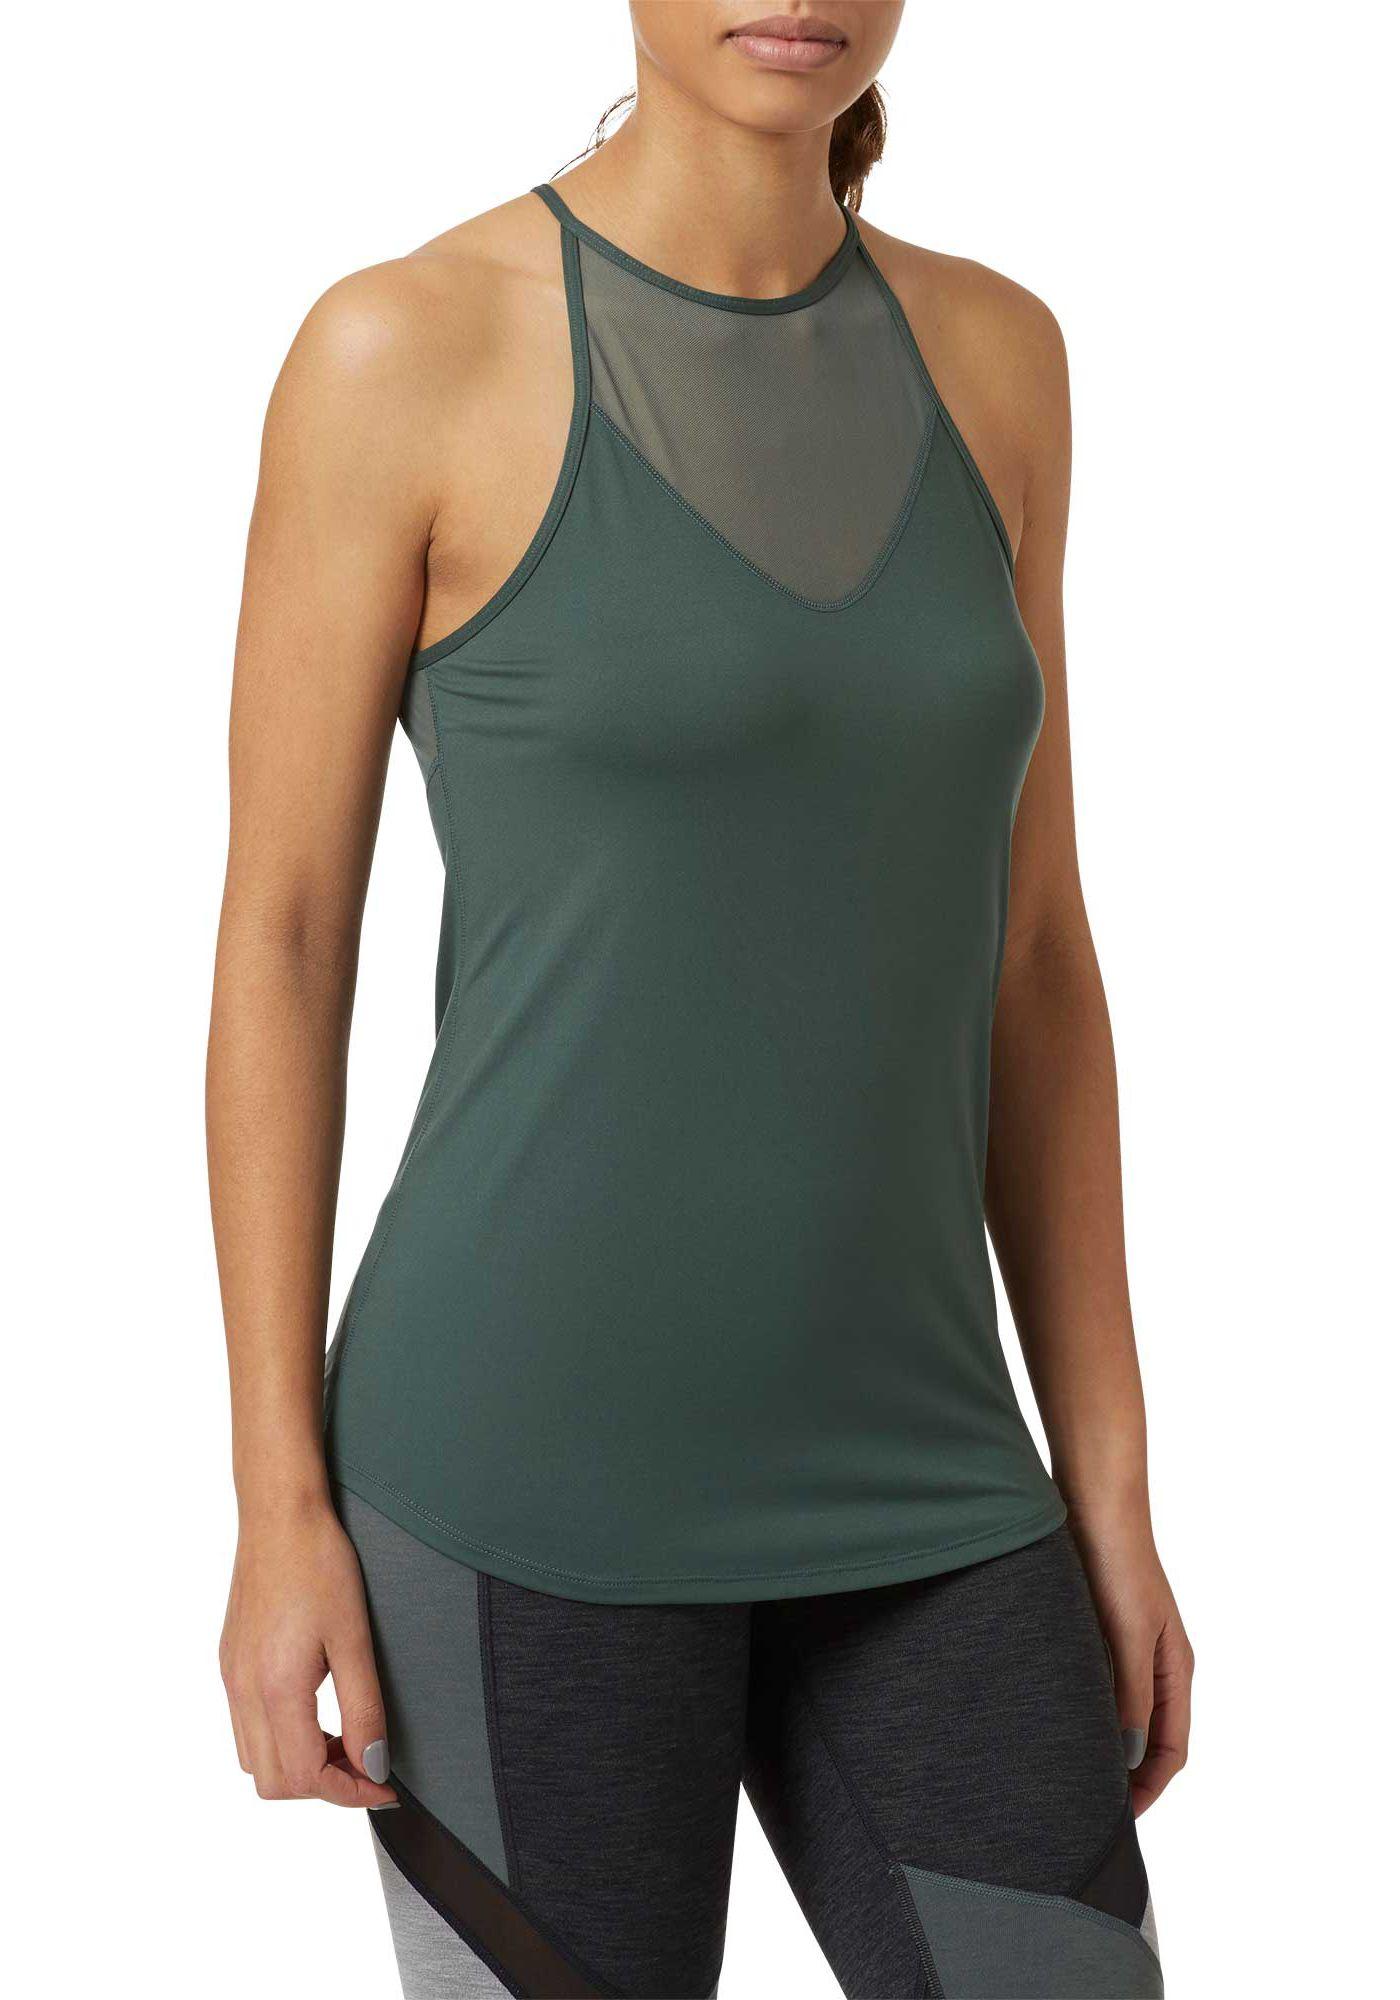 New Balance Women's Captivate Keyhole Tank Top